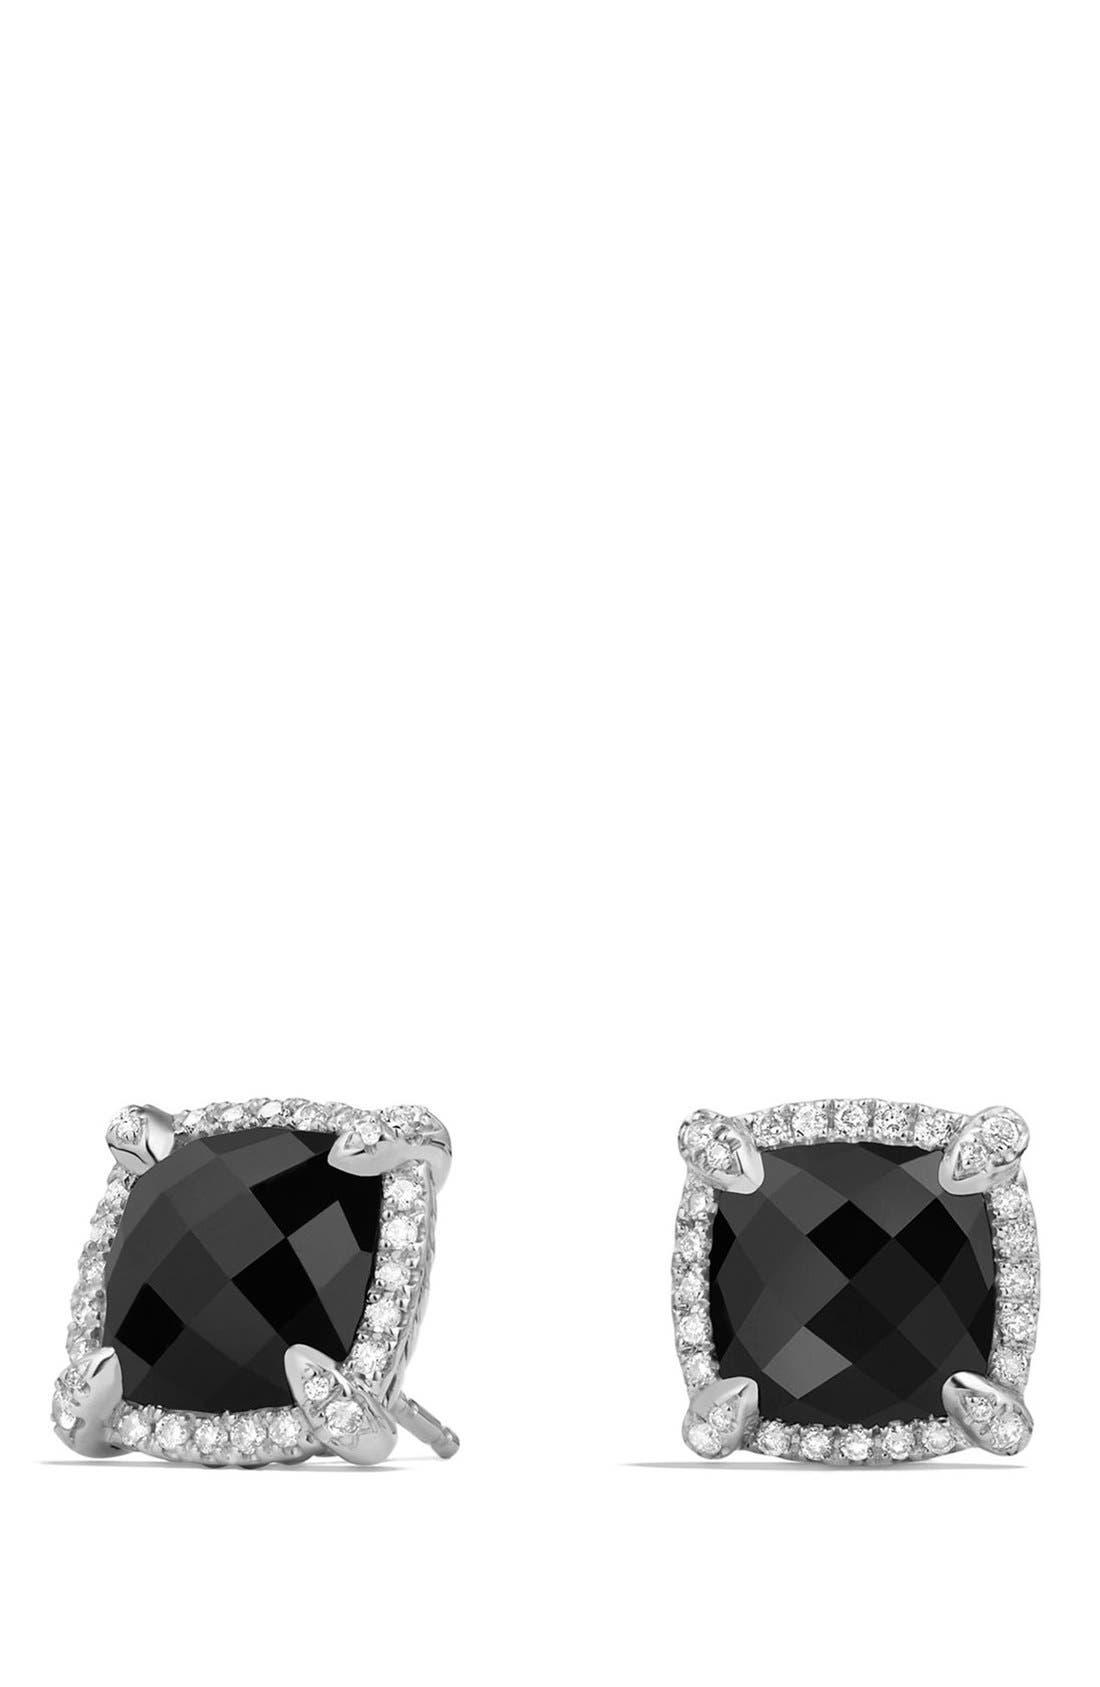 'Châtelaine' Pavé Bezel Stud Earrings with Diamonds,                             Main thumbnail 1, color,                             BLACK ONYX